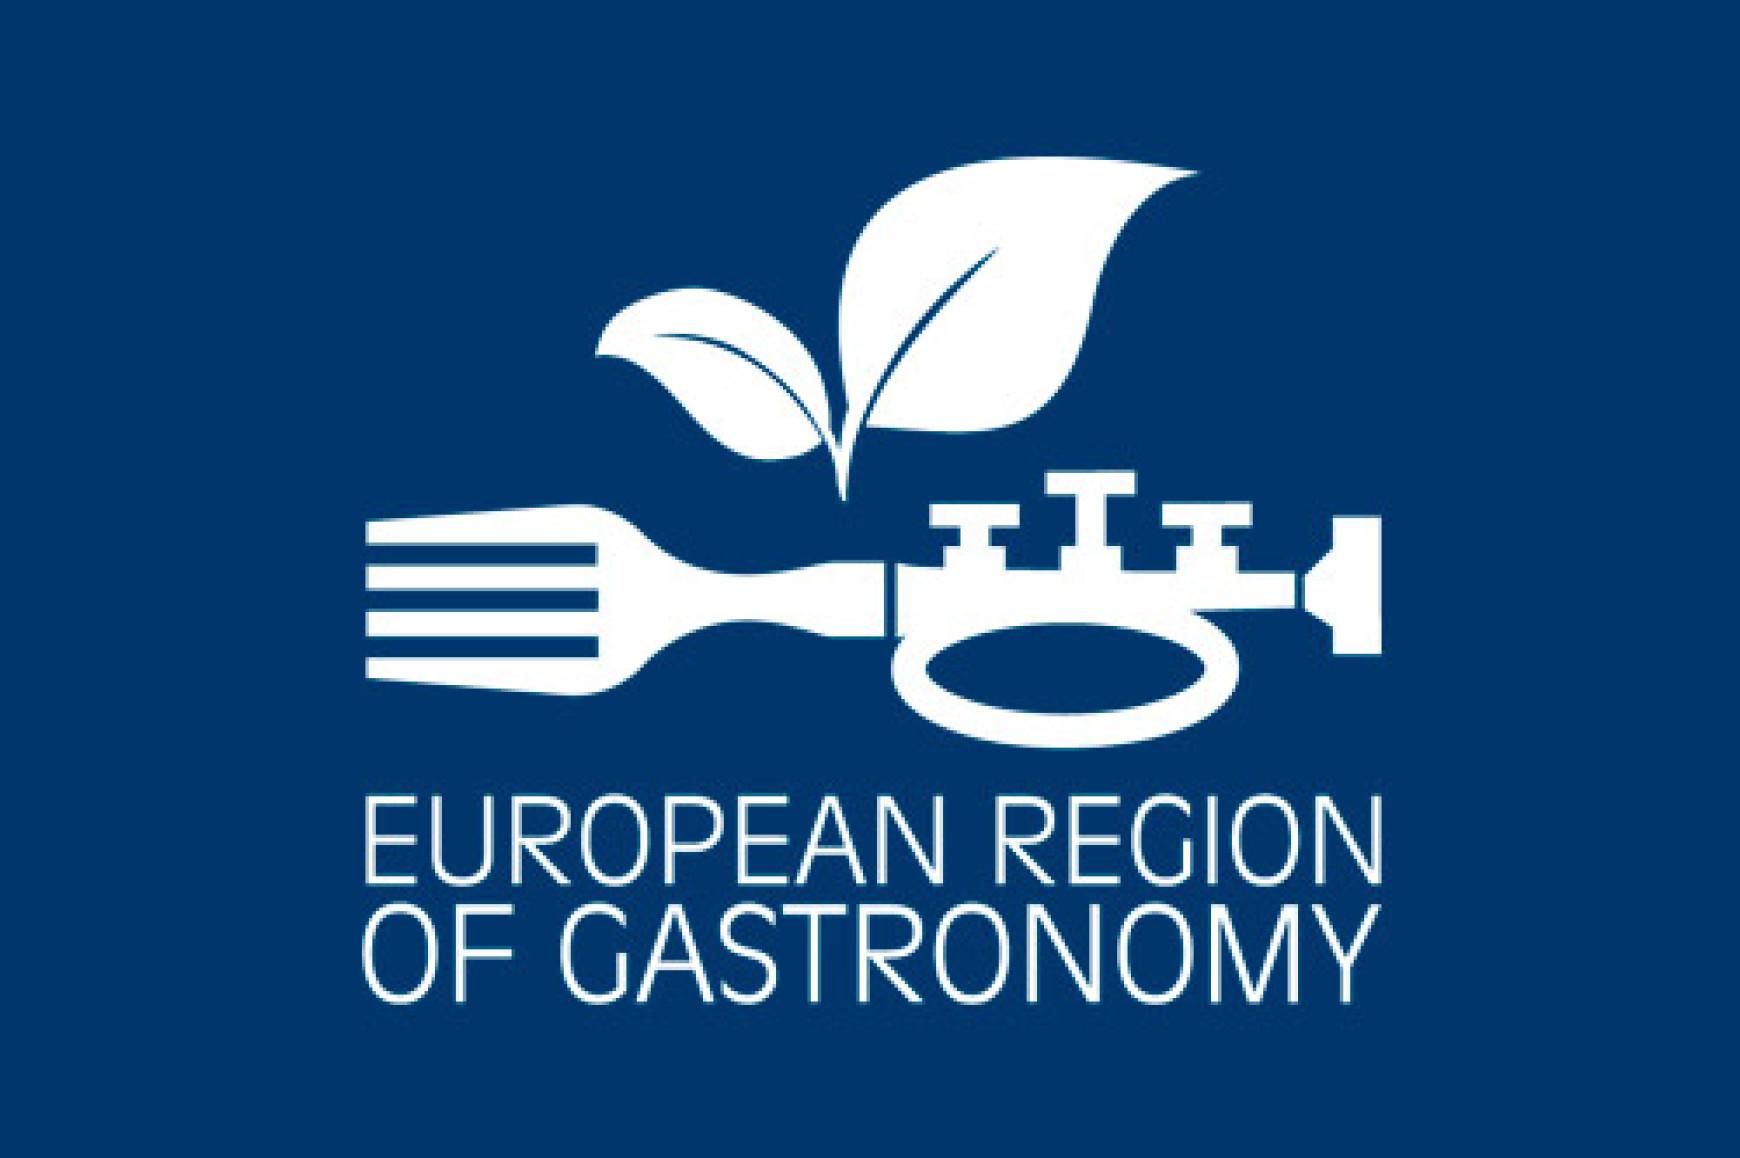 European Region of Gastronomy Award endorsed by EU institutions as a positive model for regional development